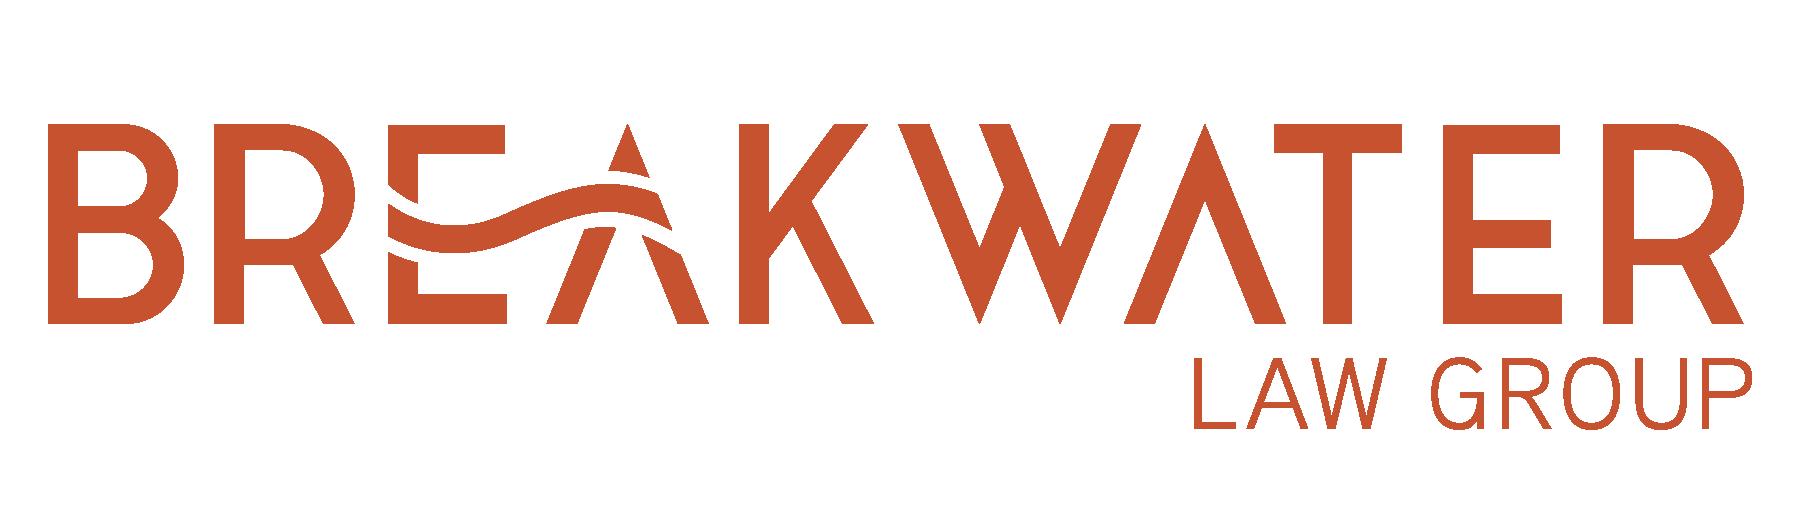 BREAKWATER-RUST-WEB.png